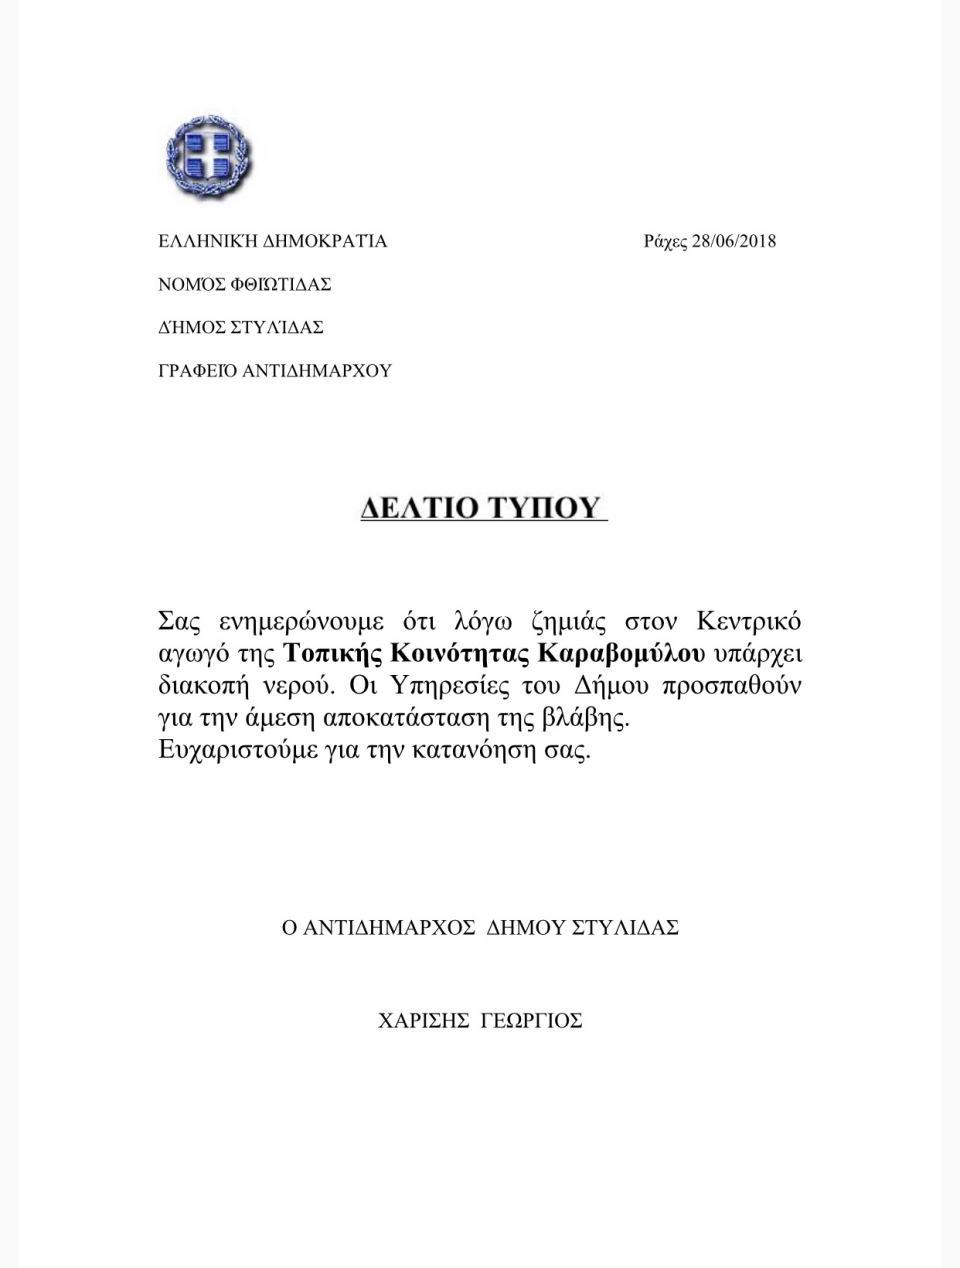 img 7169 1 ΚΑΡΑΒΟΜΥΛΟΣ ΔΙΑΚΟΠΗ ΝΕΡΟΥ